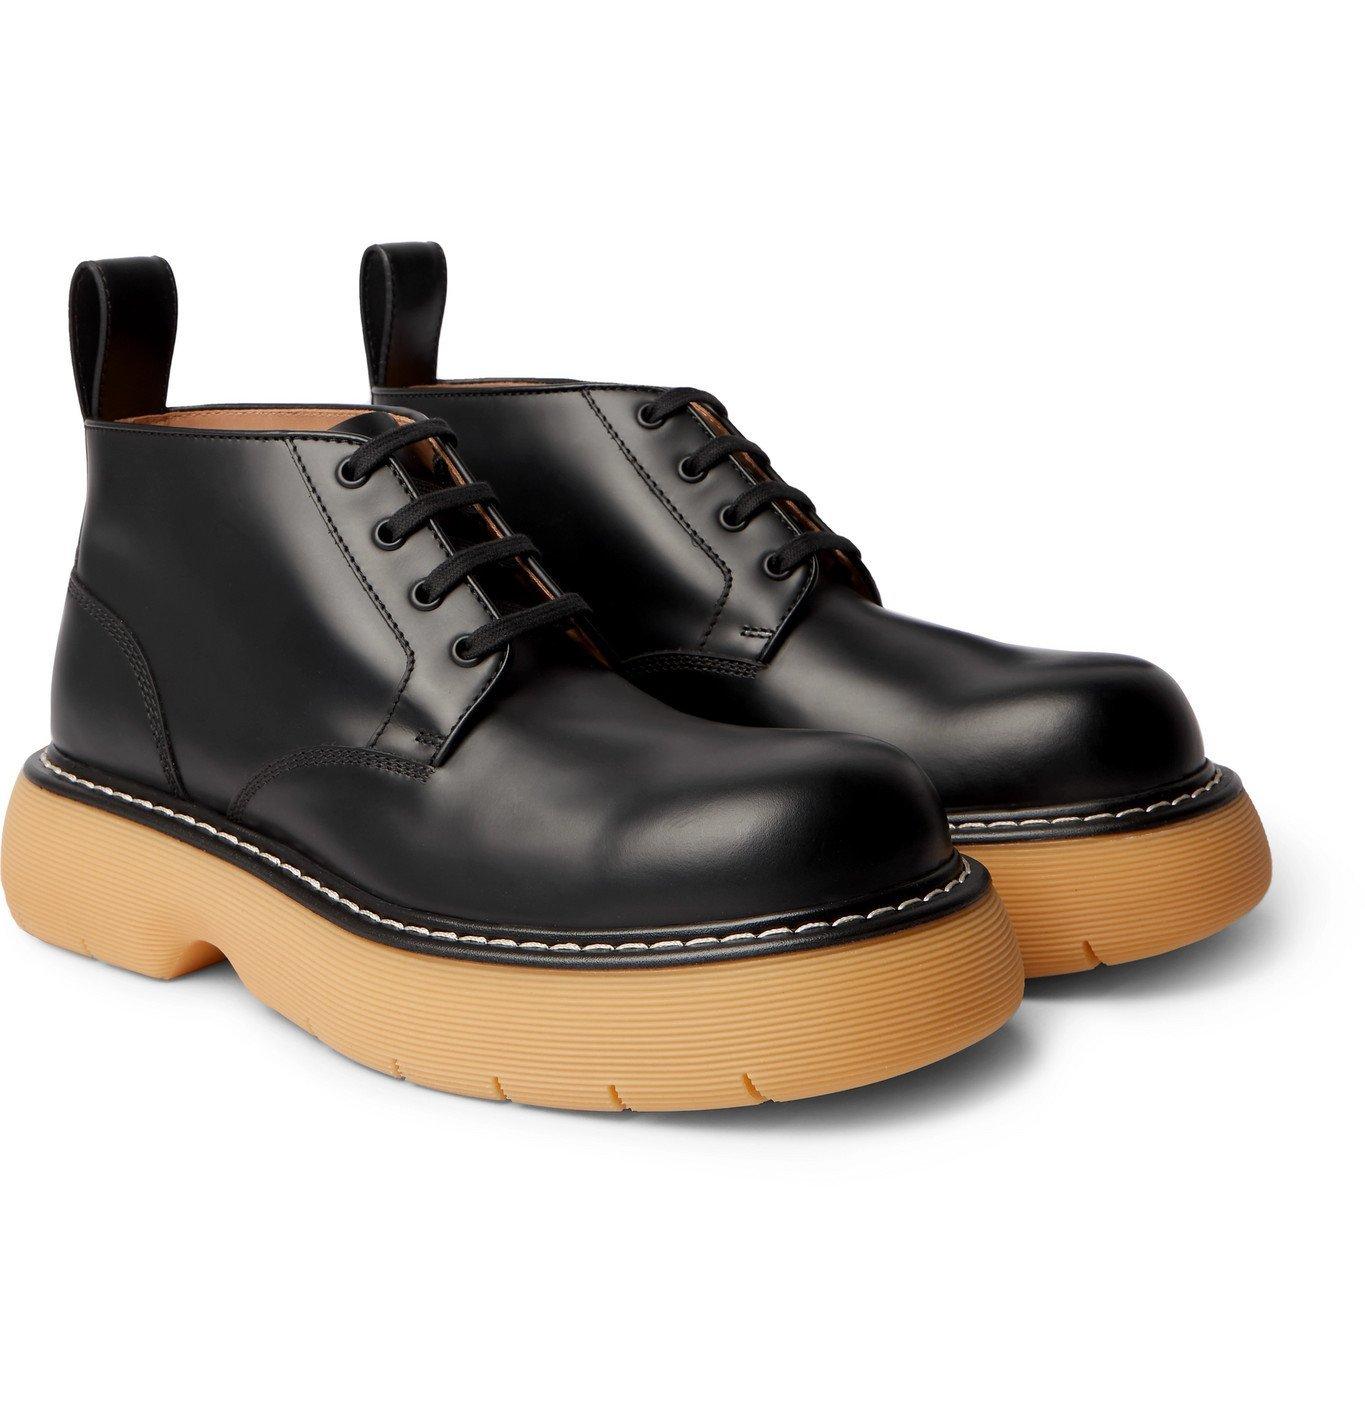 Photo: BOTTEGA VENETA - The Bounce Leather Boots - Black